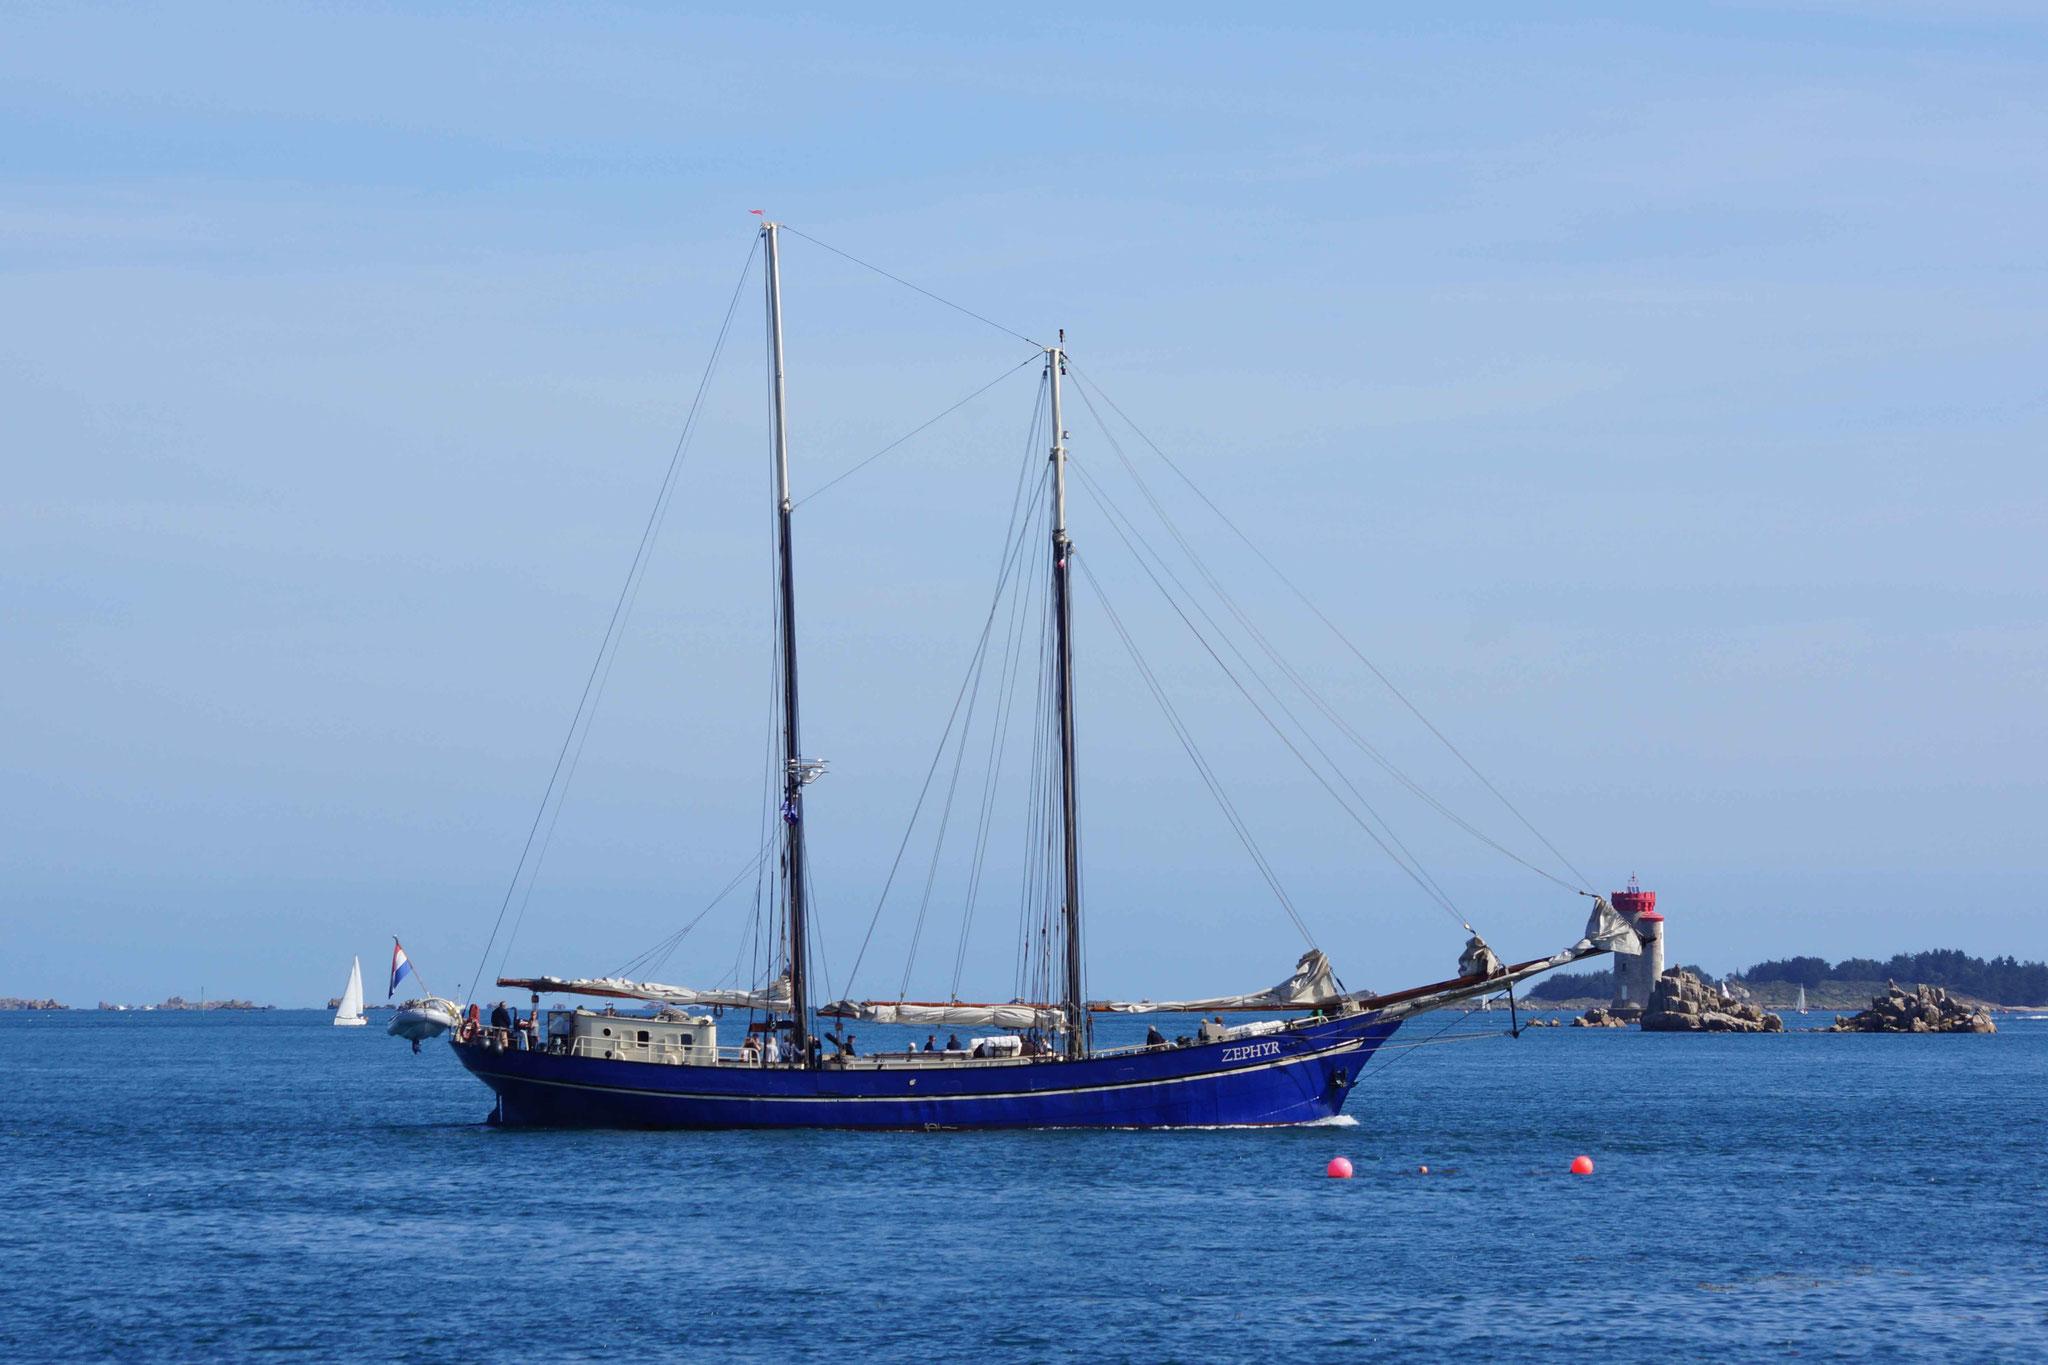 Zéphyr à Loguivy De La Mer